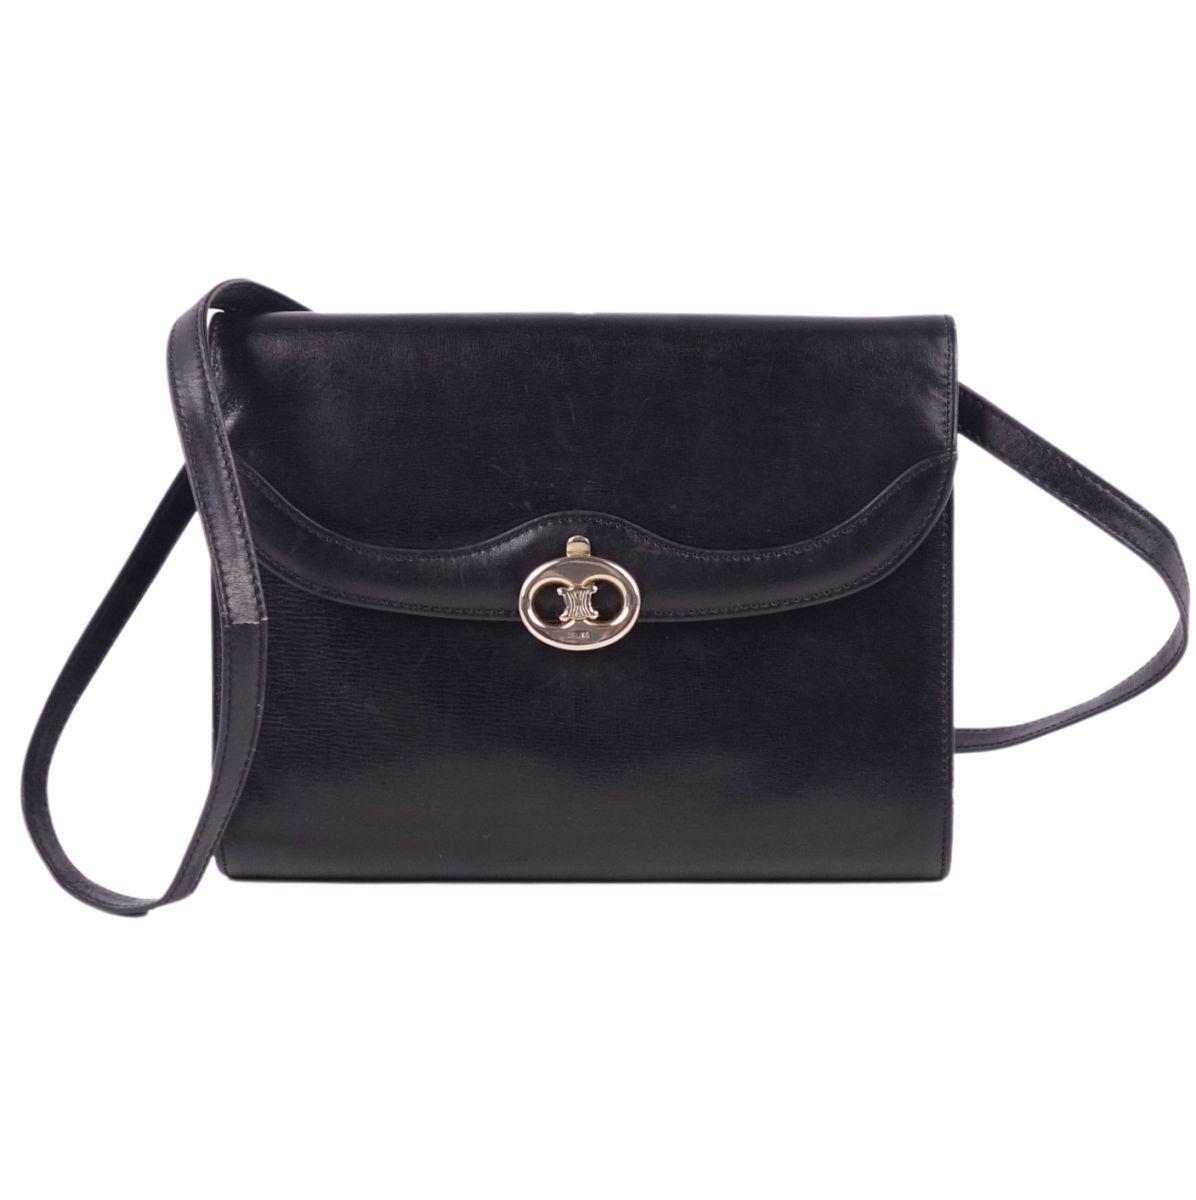 Celine CELINE Triomphe Blason Metal Fittings 2way Leather Mini Shoulder Crossbody Clutch Ladies Black